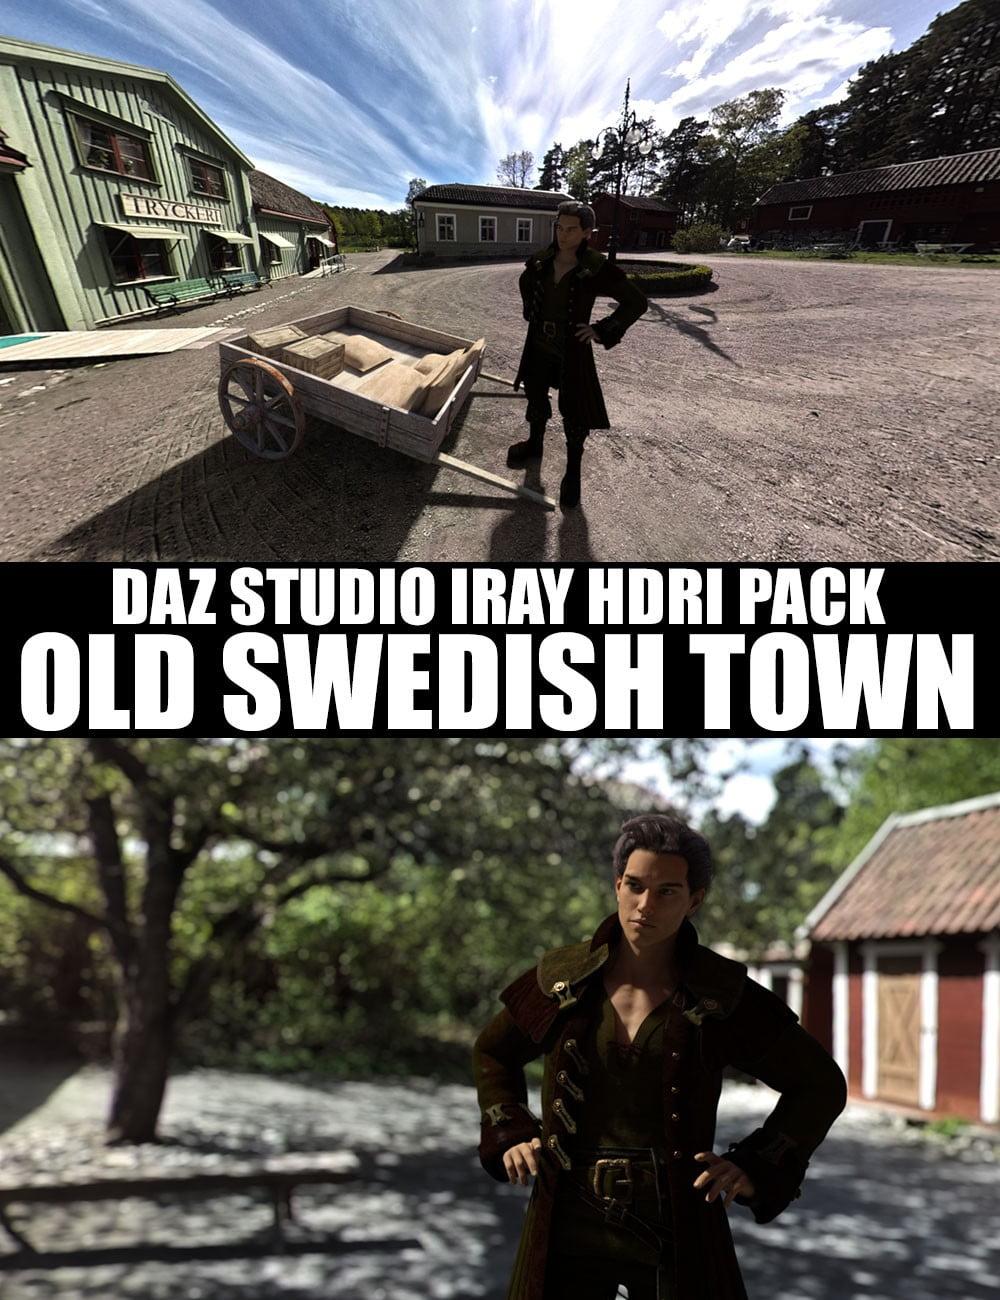 Old Swedish Town - DAZ Studio Iray HDRI Pack